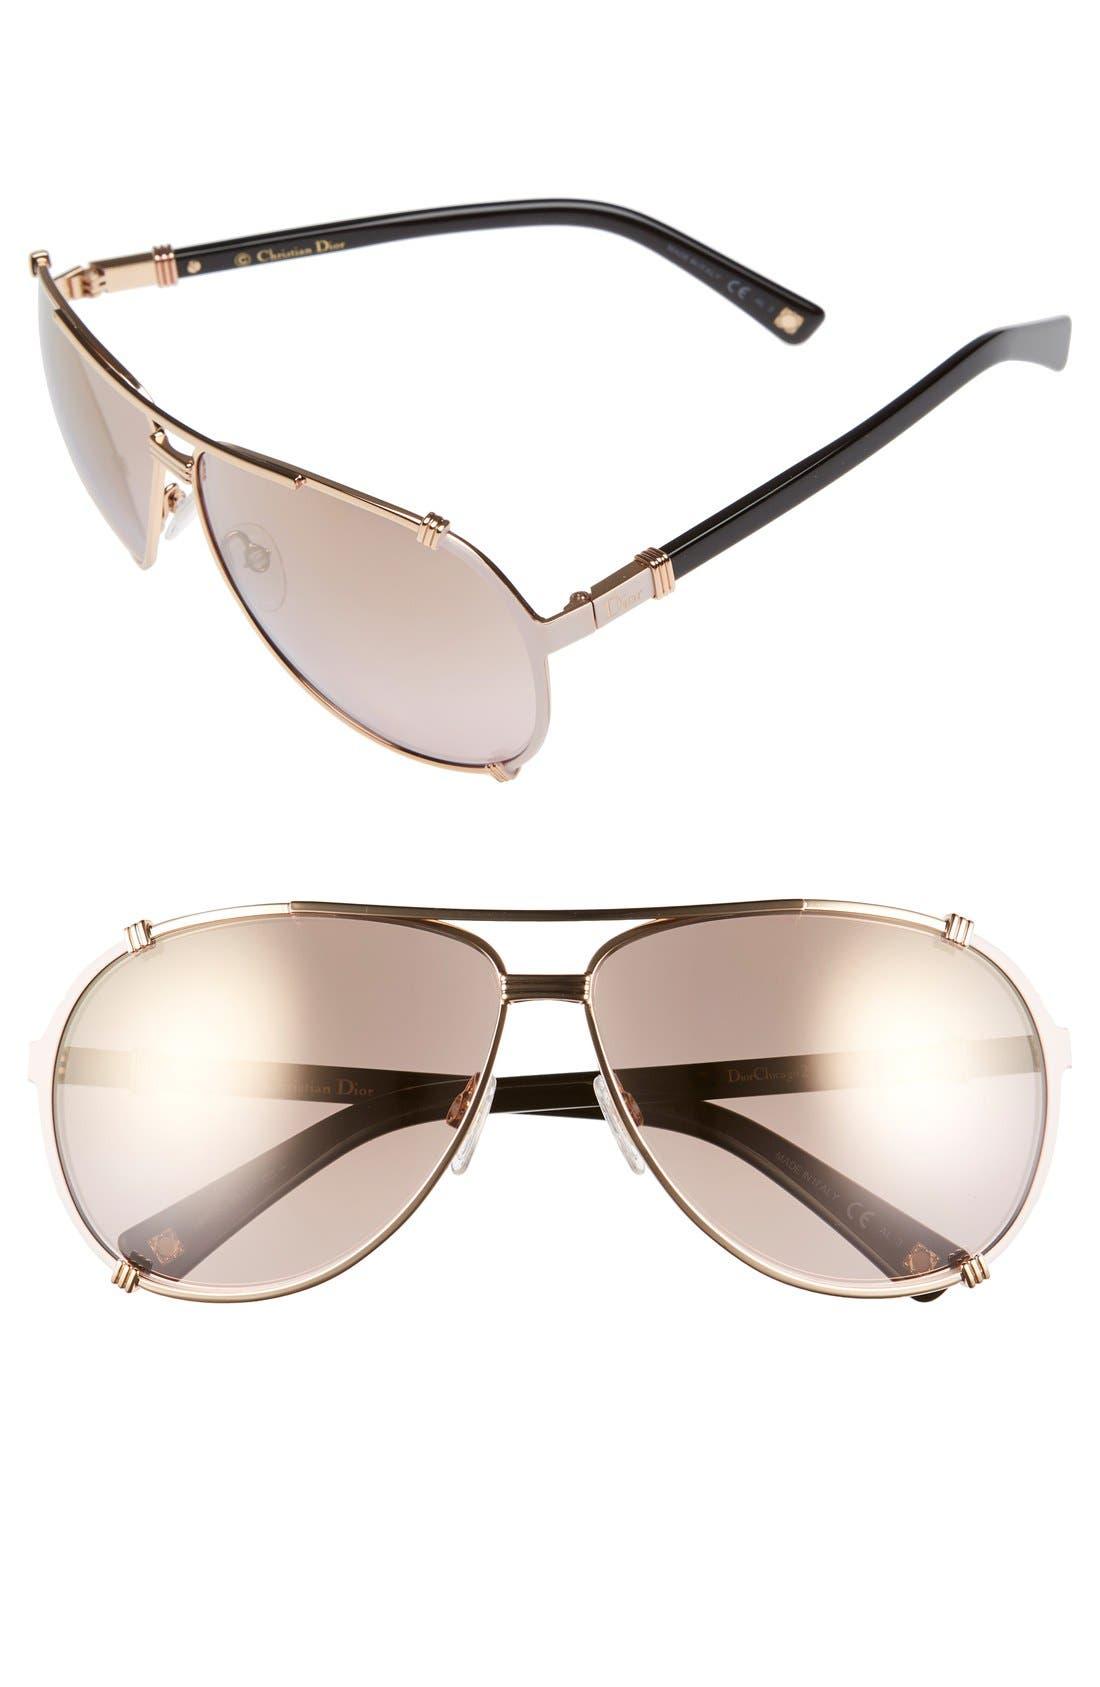 Main Image - Dior 'Chicago' 63mm Metal Aviator Sunglasses